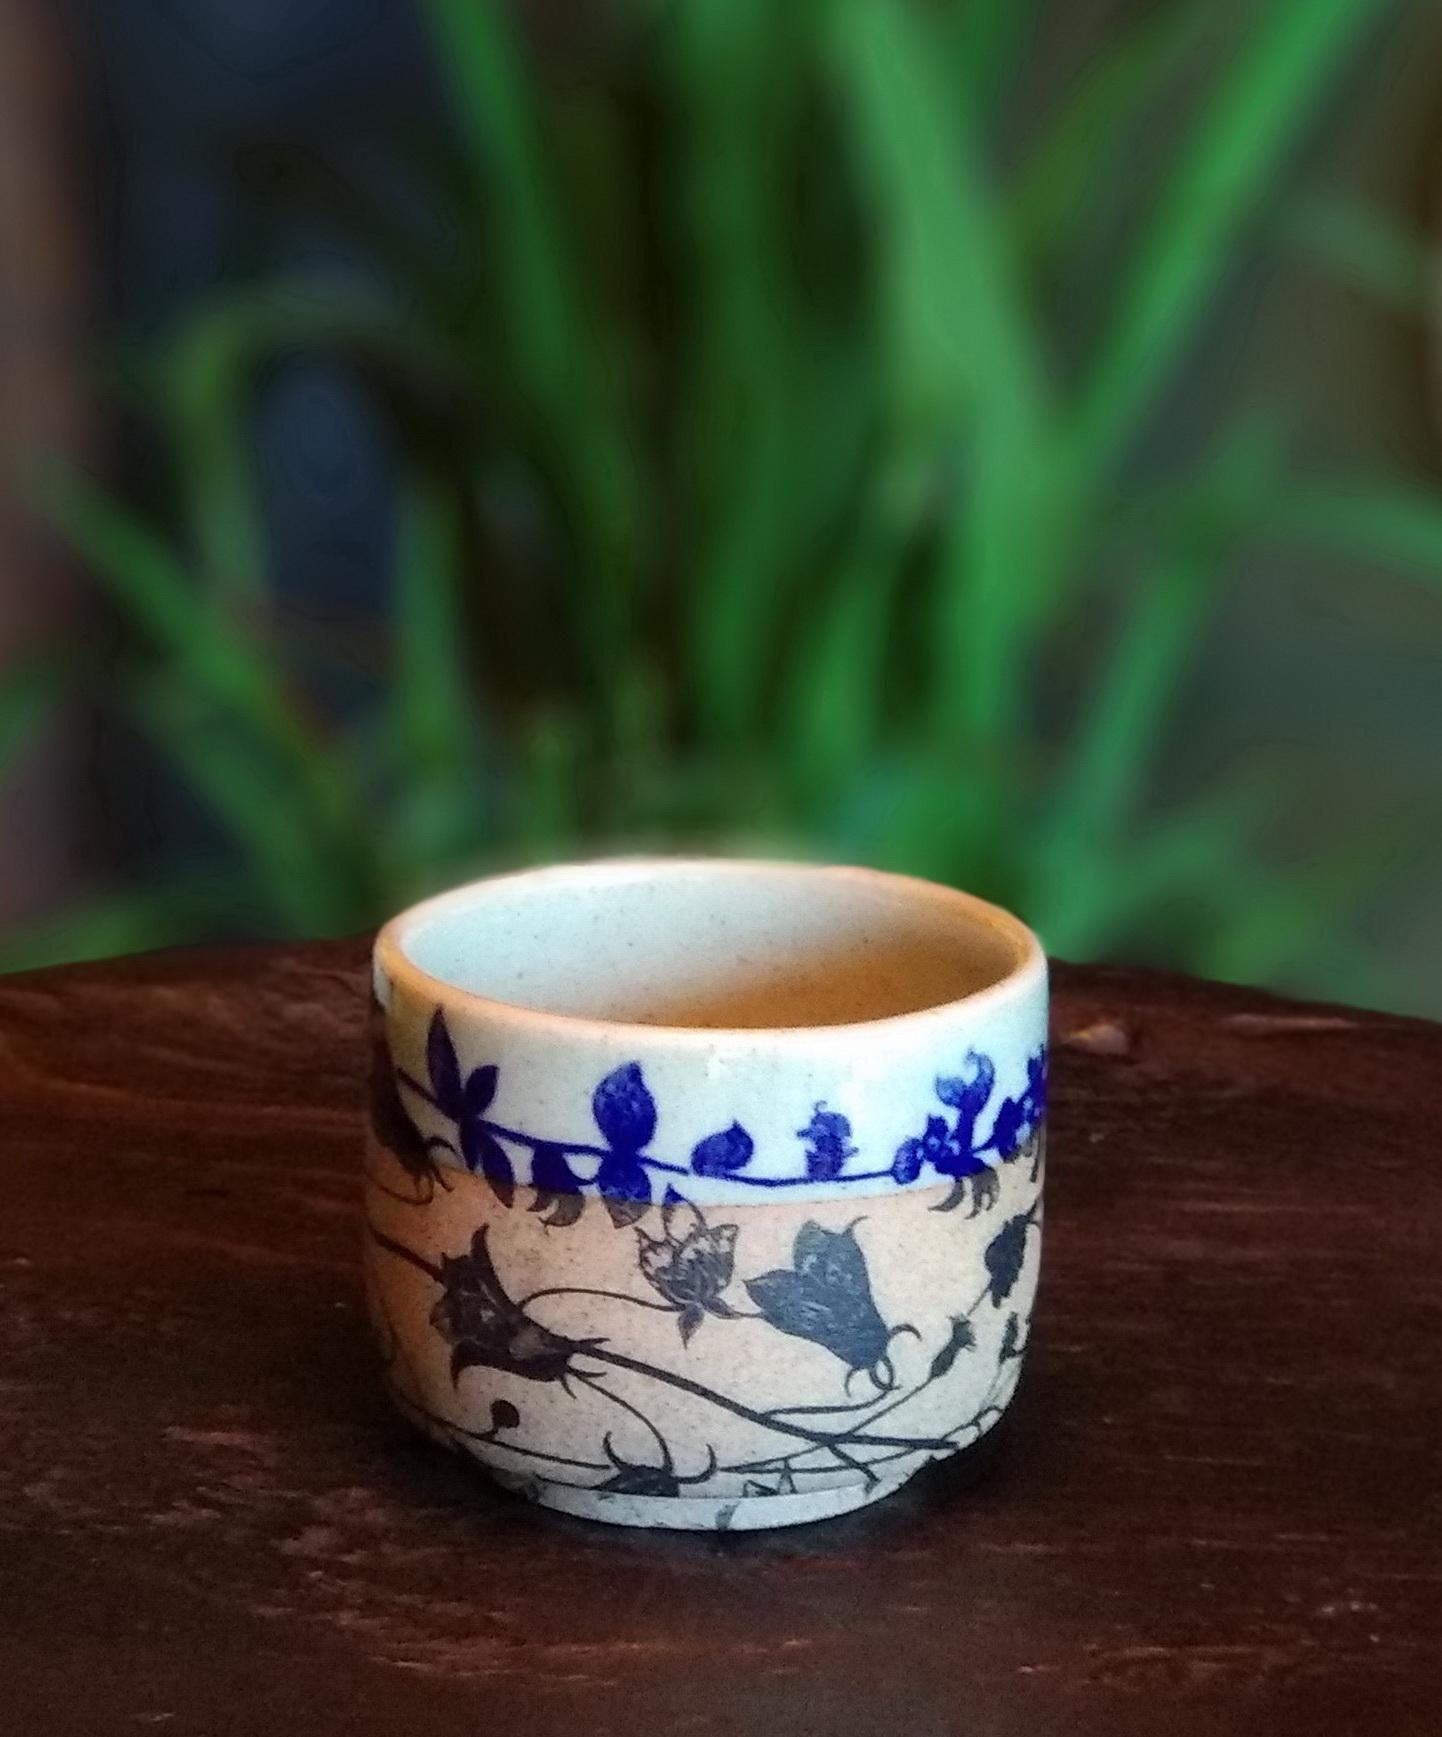 tea cup dry brown blue shiny ash celadon.jpg